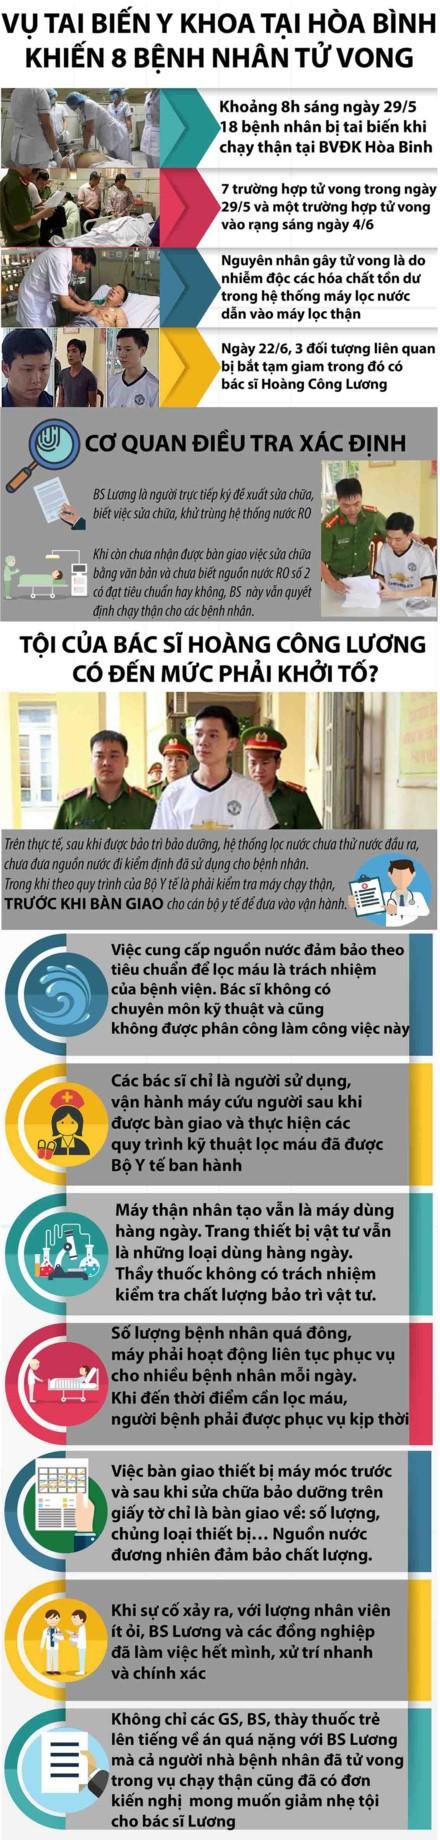 Infographic: Toi cua bac si Hoang Cong Luong co den muc phai khoi to?